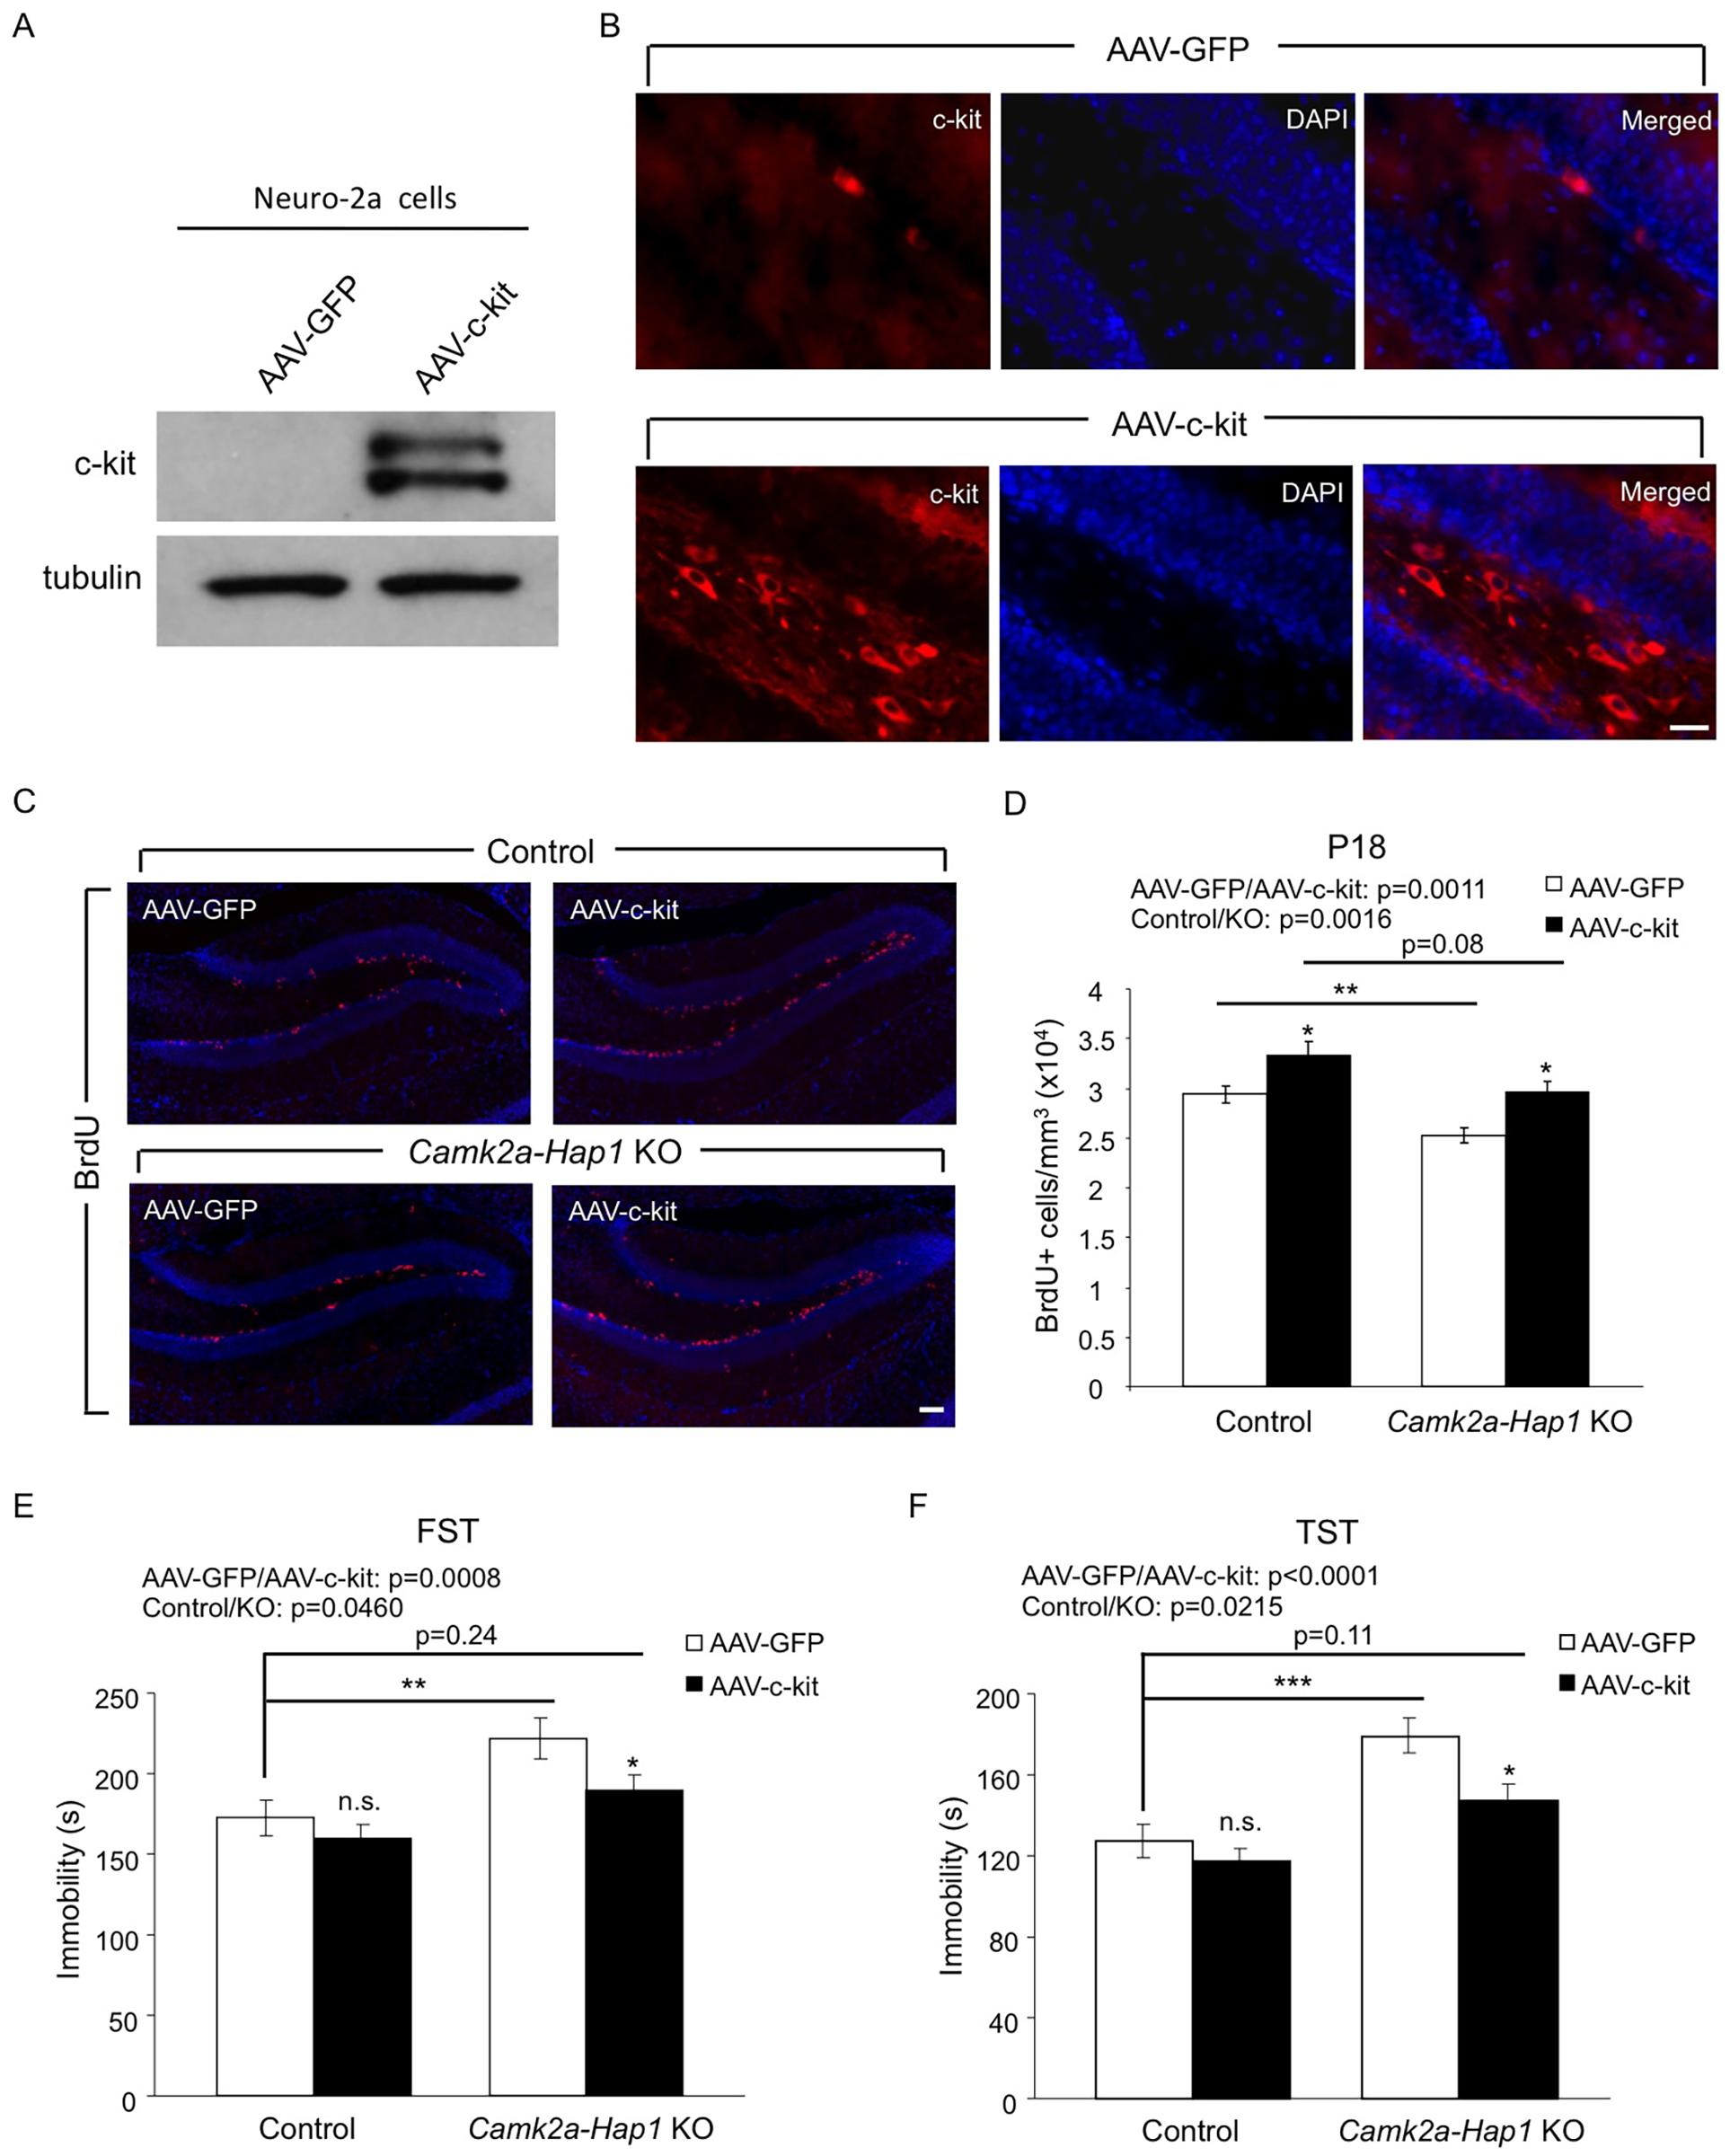 Overexpression of c-kit rescues postnatal neurogenesis defect and adult depressive-like phenotype in <i>camk2a-Hap1</i> KO mice.